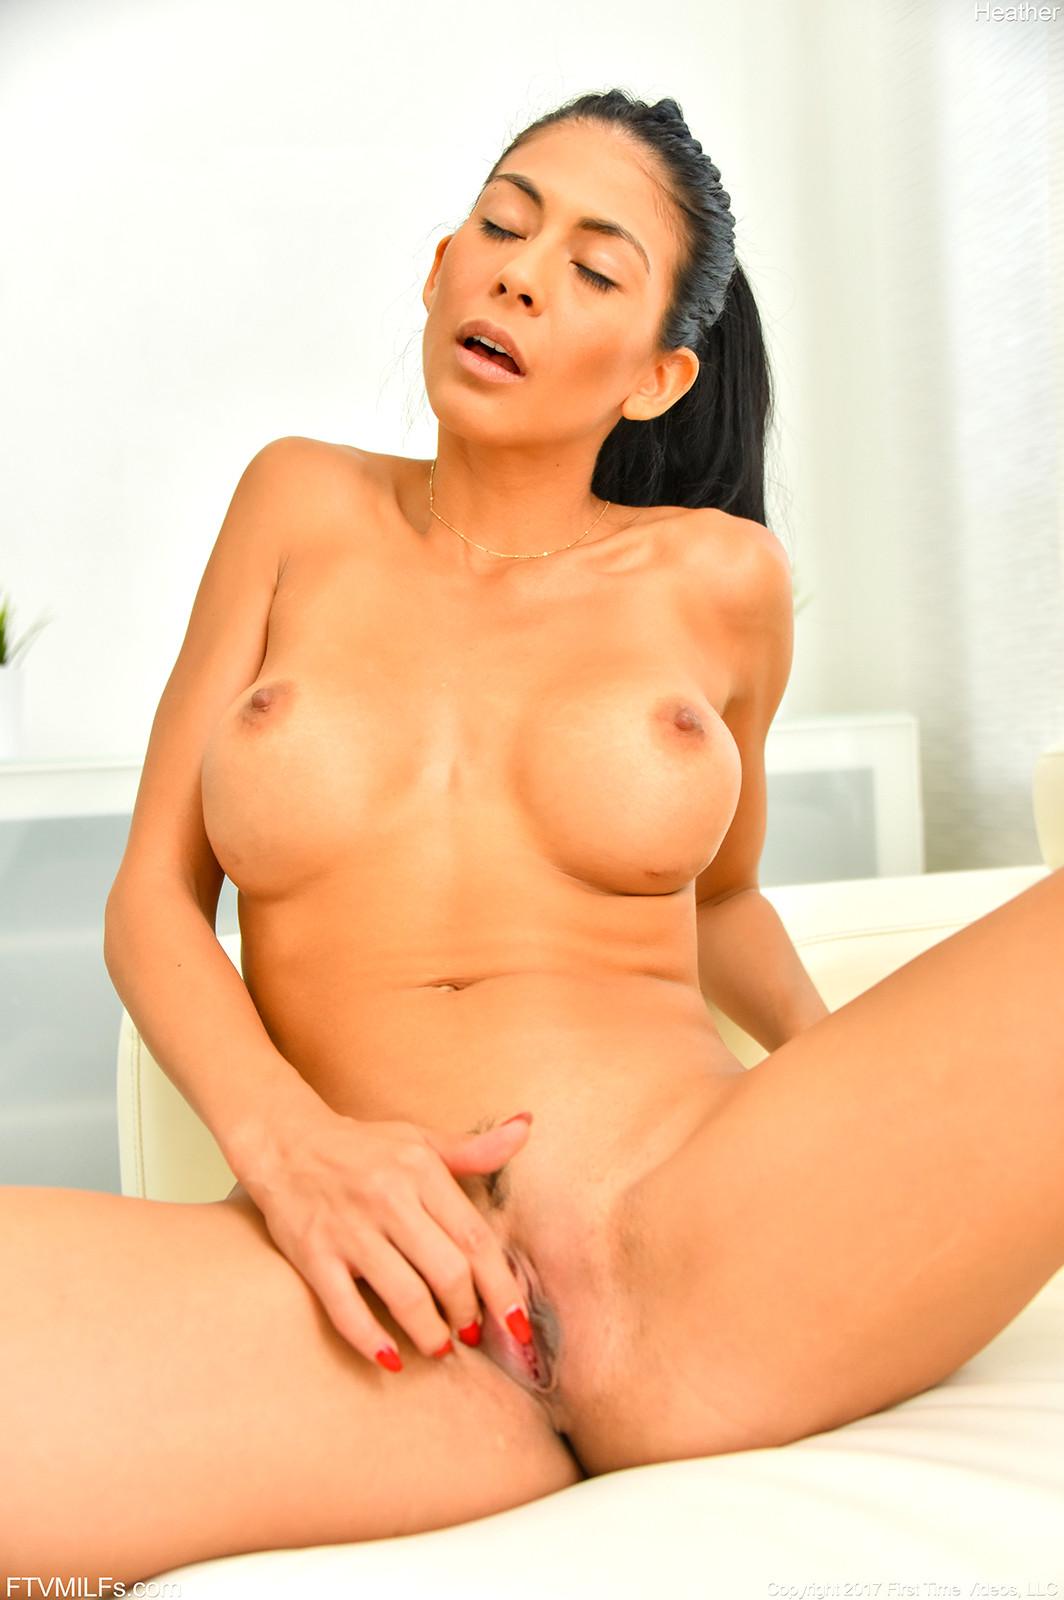 Babe Today Ftv Milfs Heather Vahn Skillful Big Tits -7088